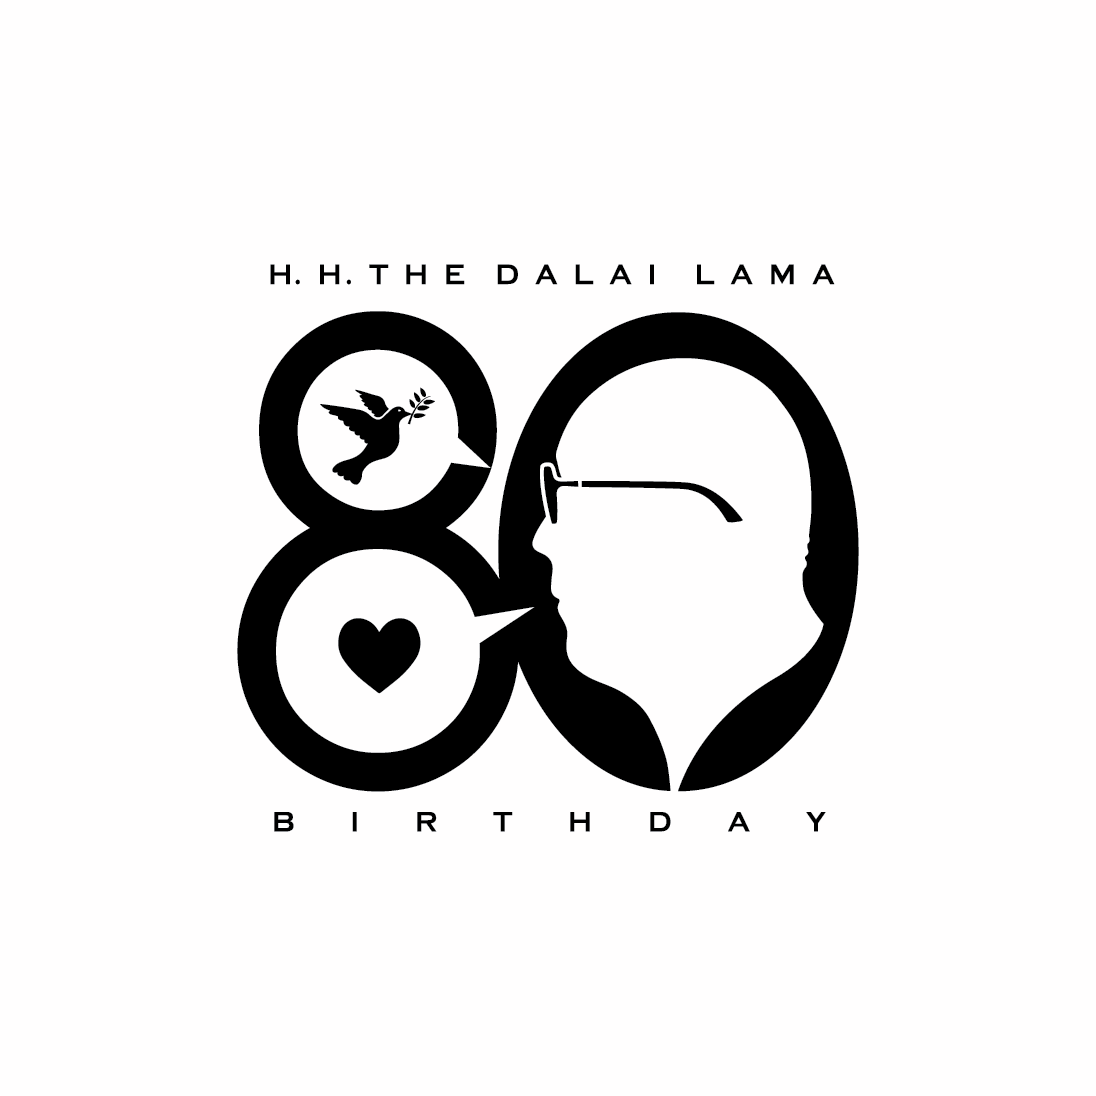 His Holiness The Dalai Lama S 80th Birthday Celebration Logo By Lonzz Gagatsang Logos Anniversary Logo Logo Illustration